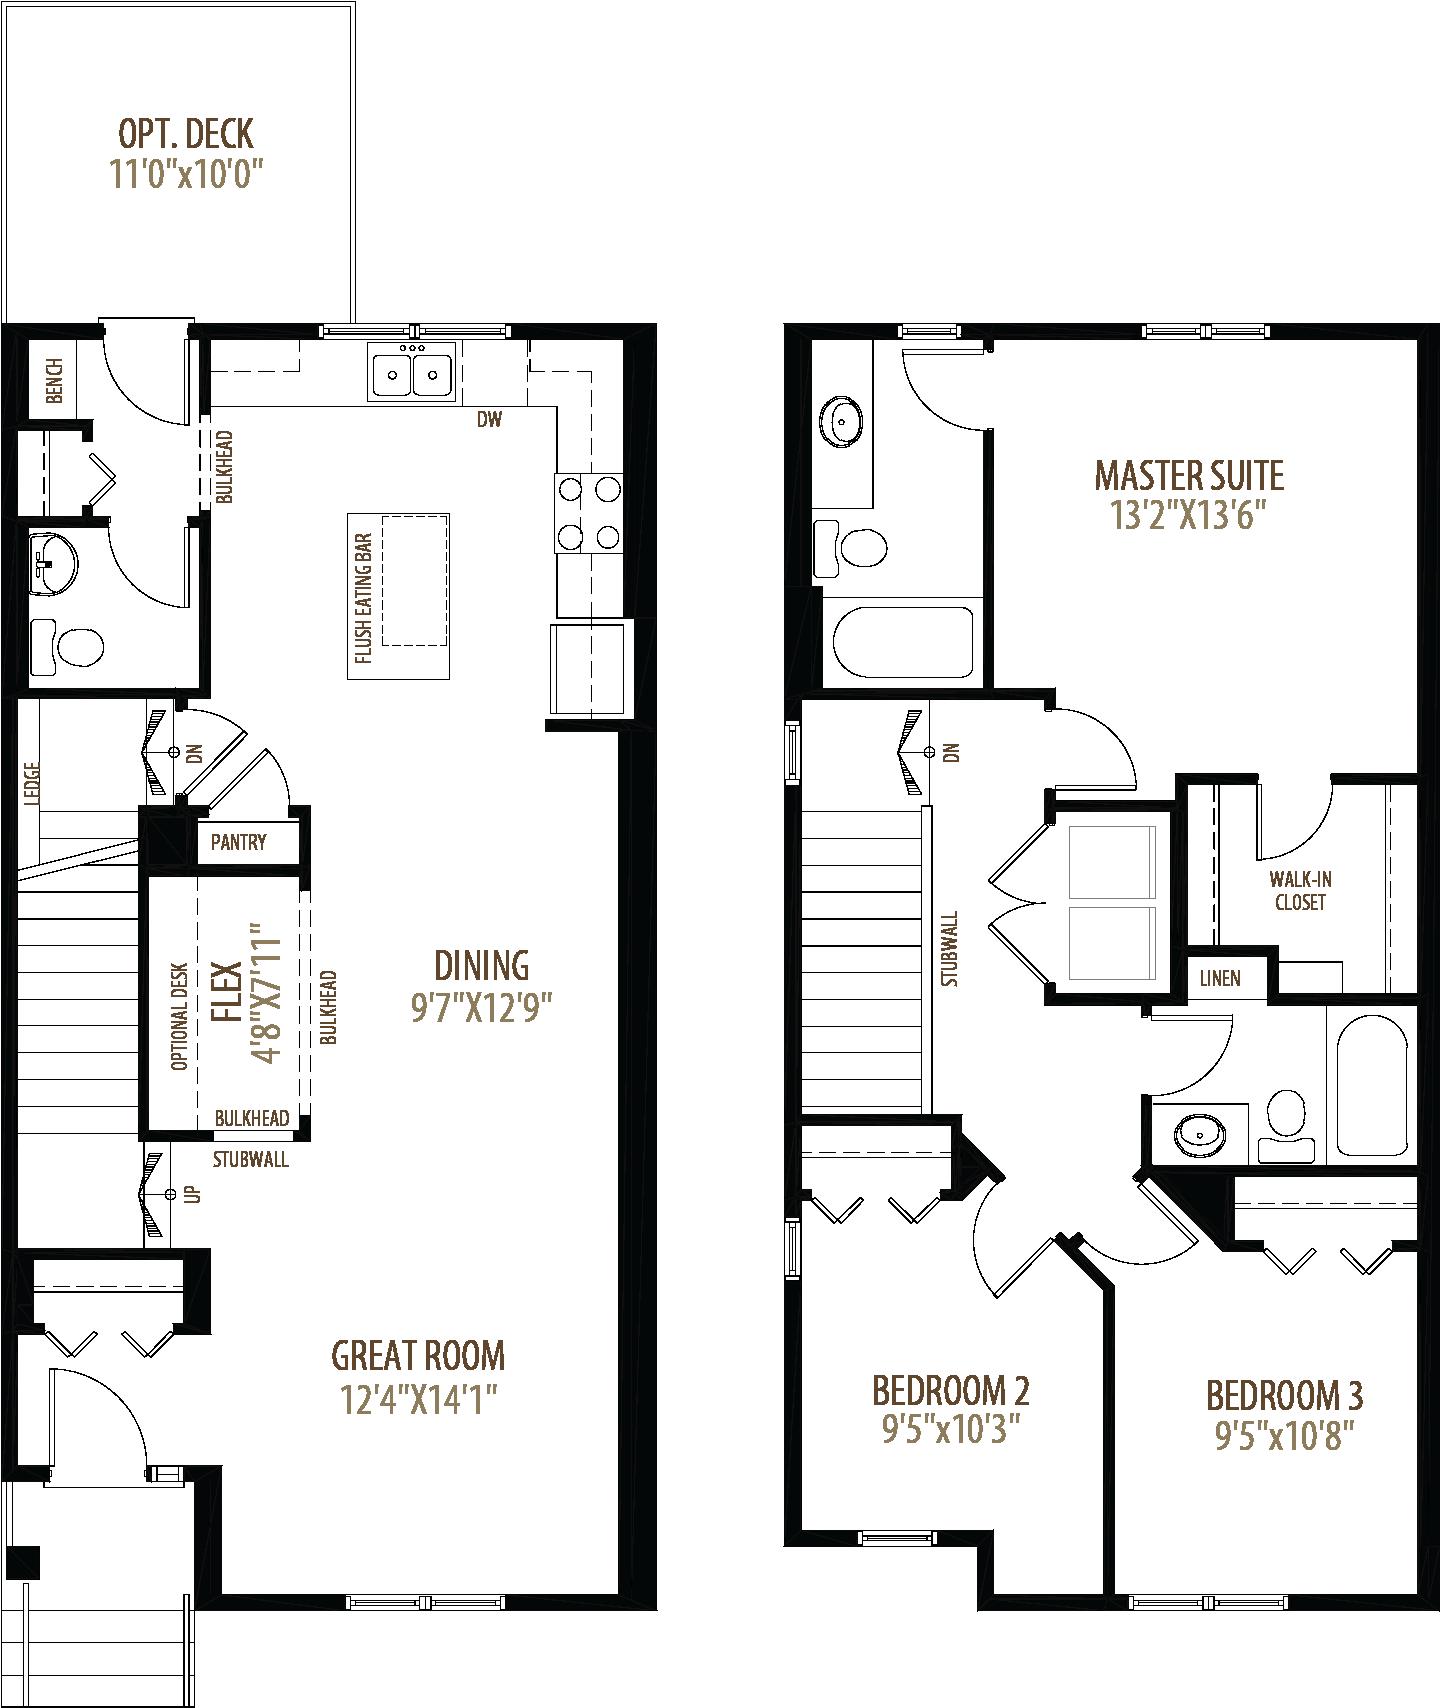 204 Dawson Drive Floorplan